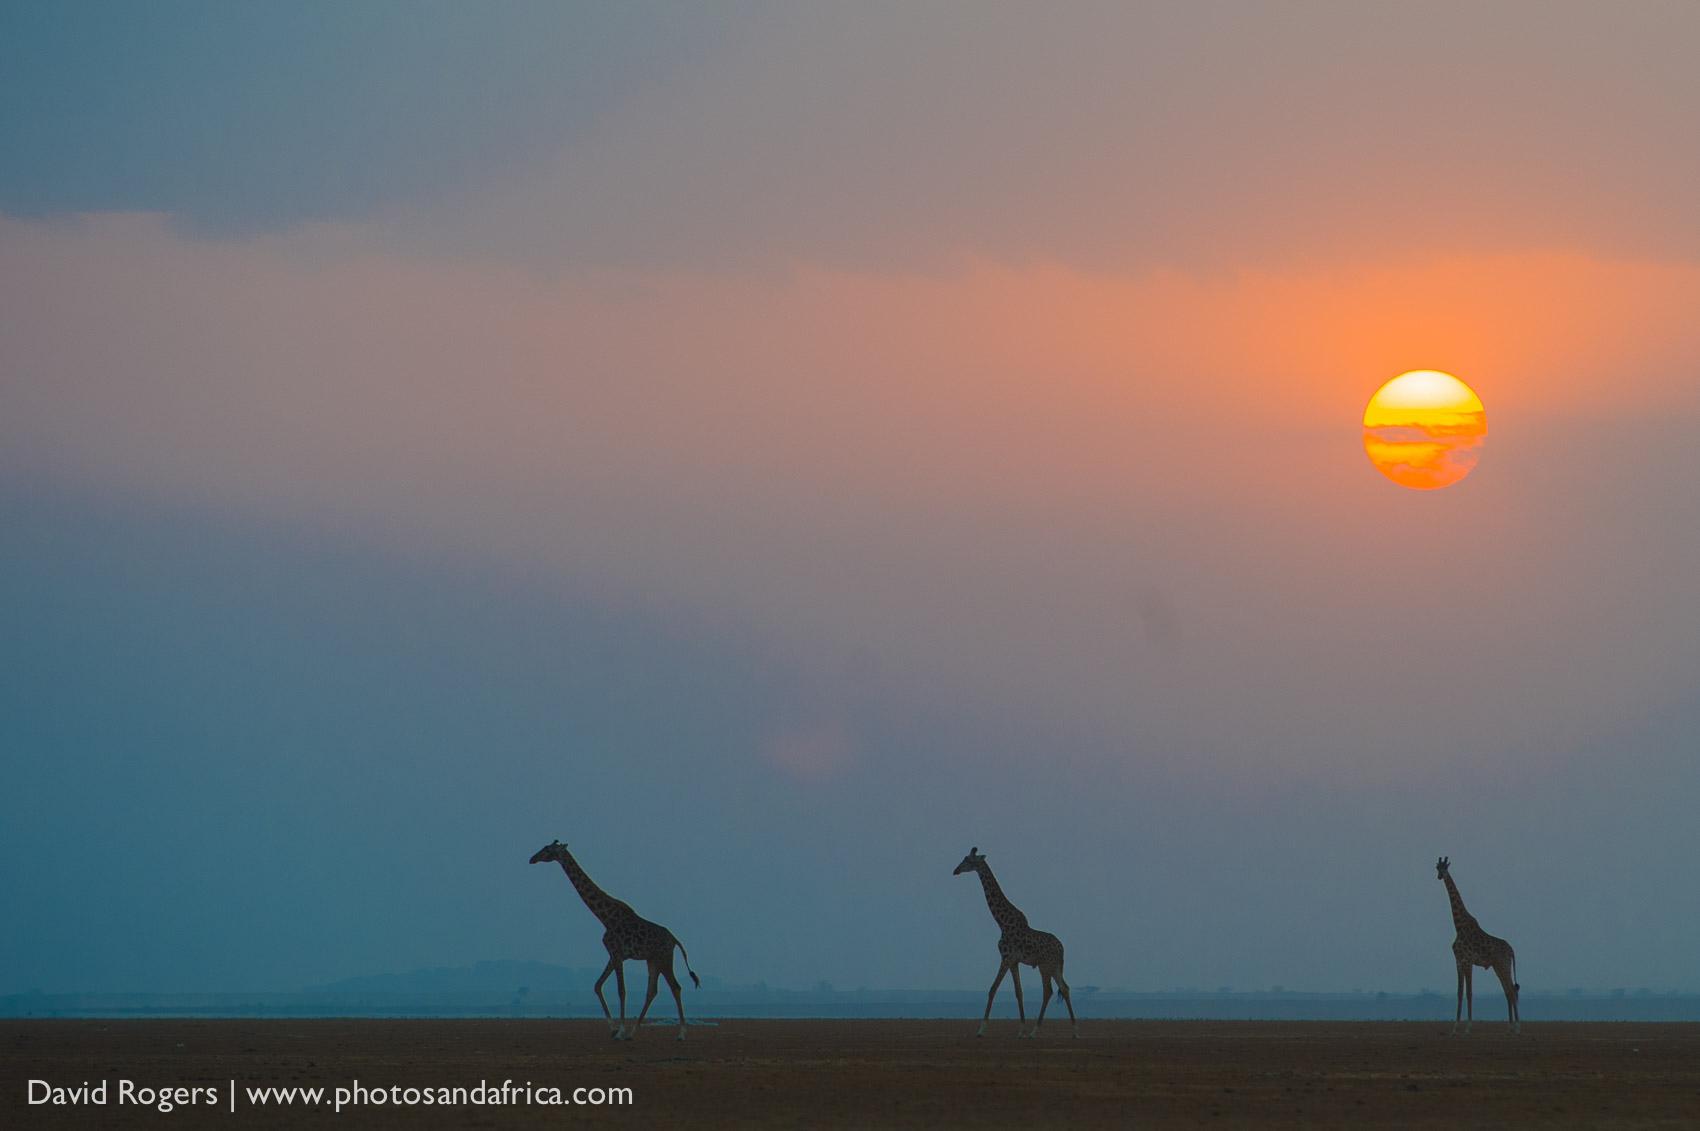 Kenya, Amboseli National Park, sunset with the silhouettes of three giraffe ©David Rogers